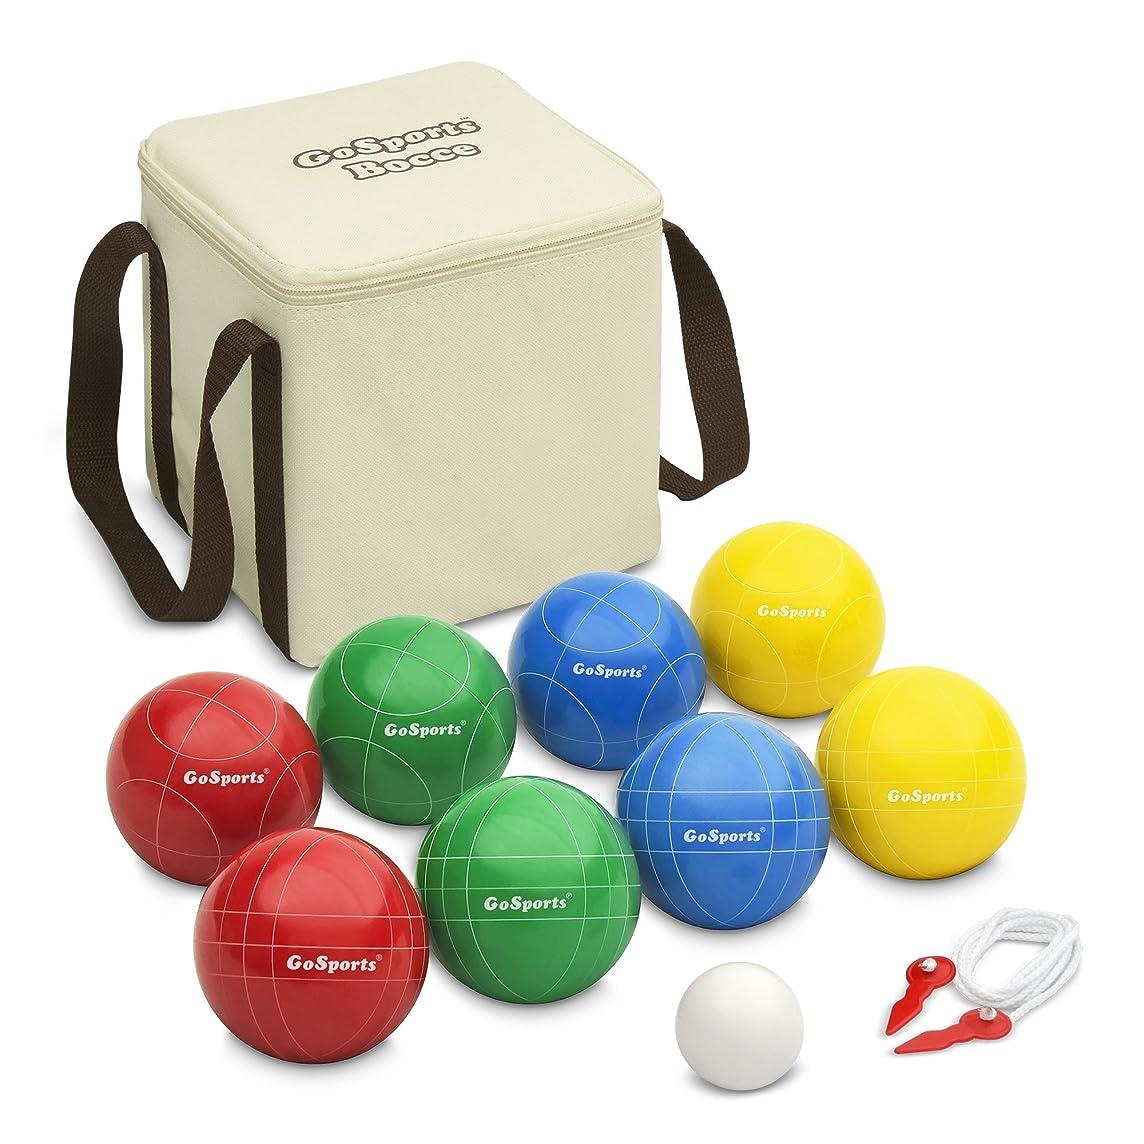 GoSports 90mm Backyard Bocce Set with 8 Balls, Pallino, Case and Measuring Rope   Choose Hard Resin Balls or Soft Rubber Balls